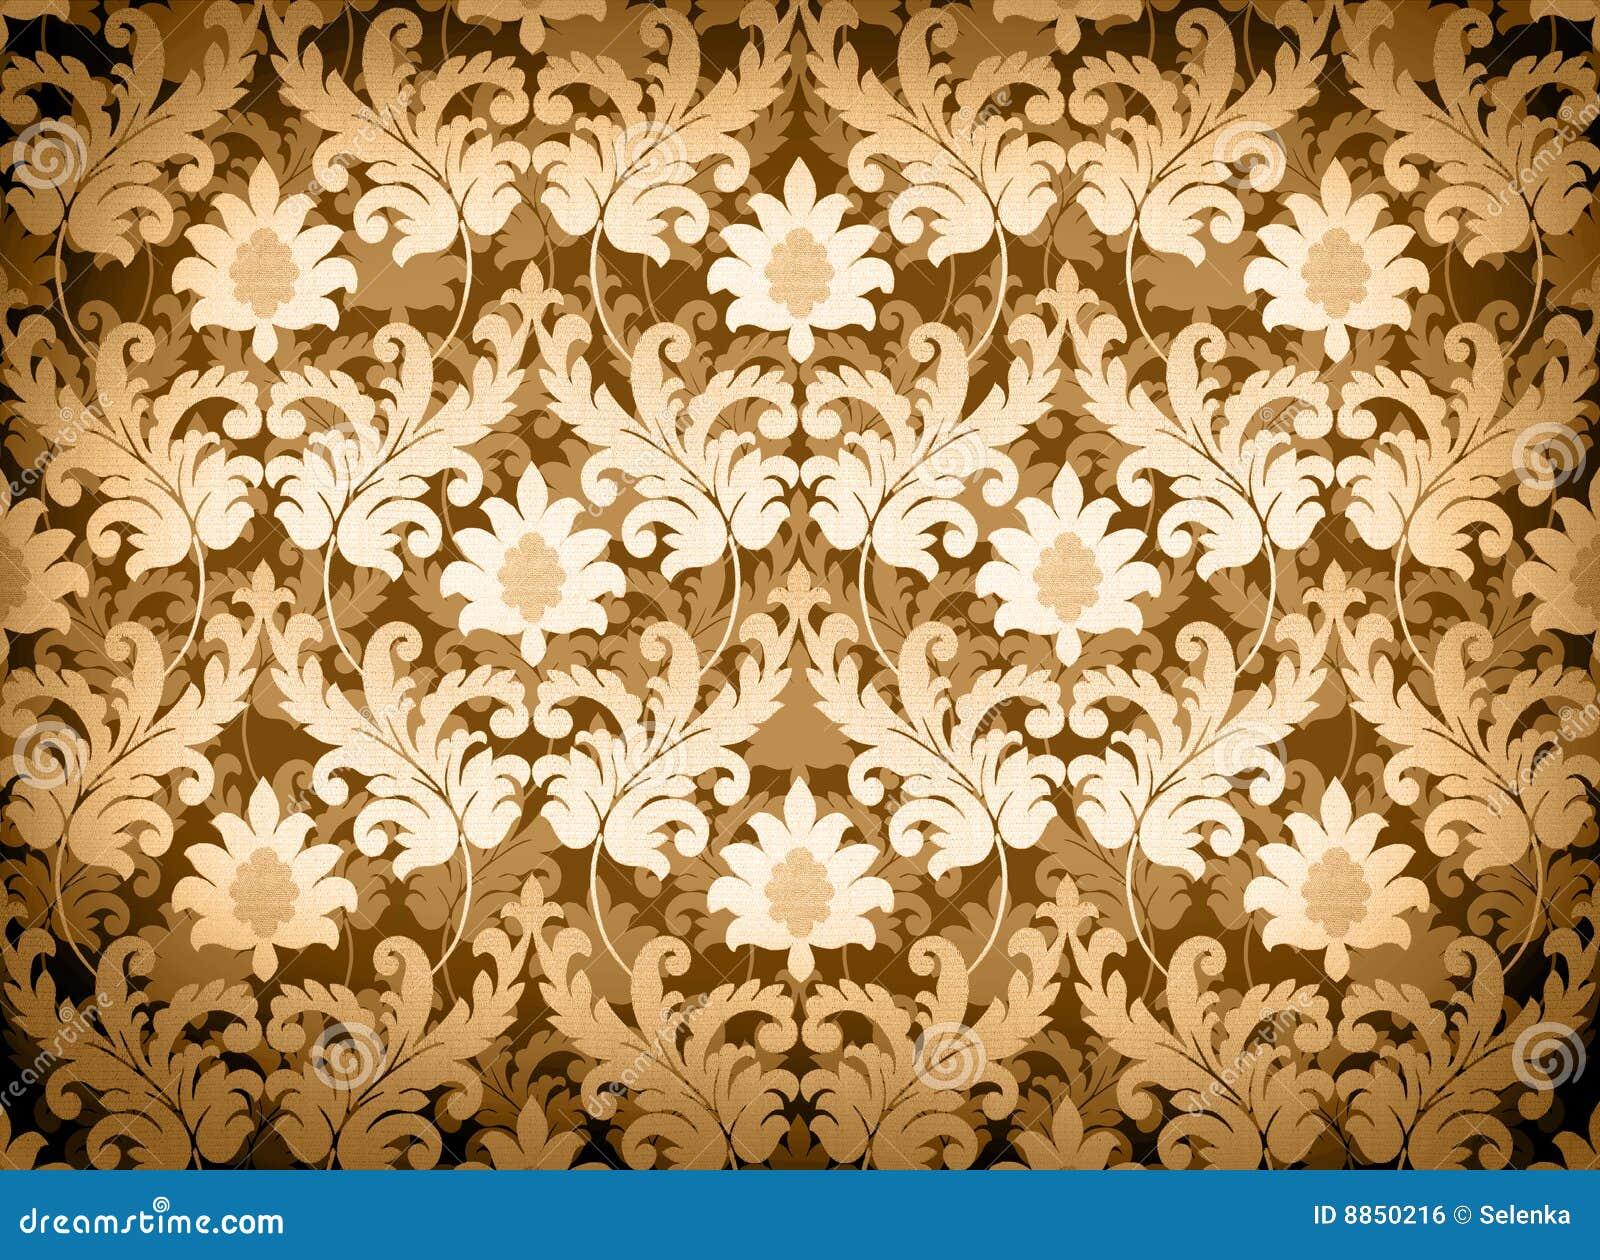 Light Gold Renaissance Background Royalty Free Stock Image